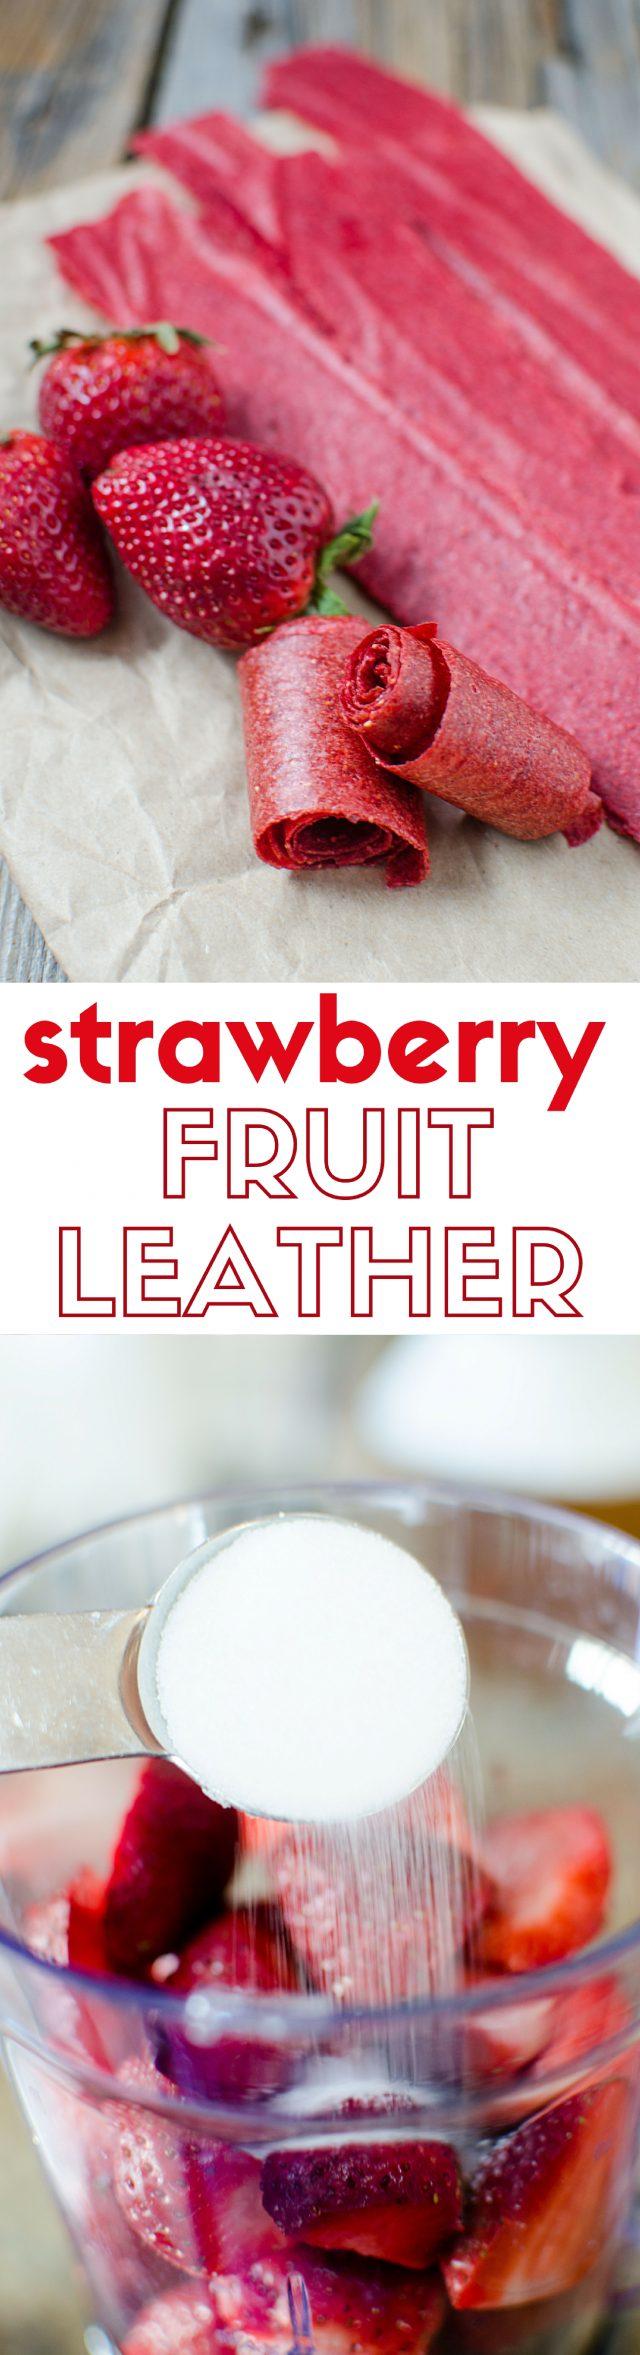 Strawberry Fruit Leather Recipe